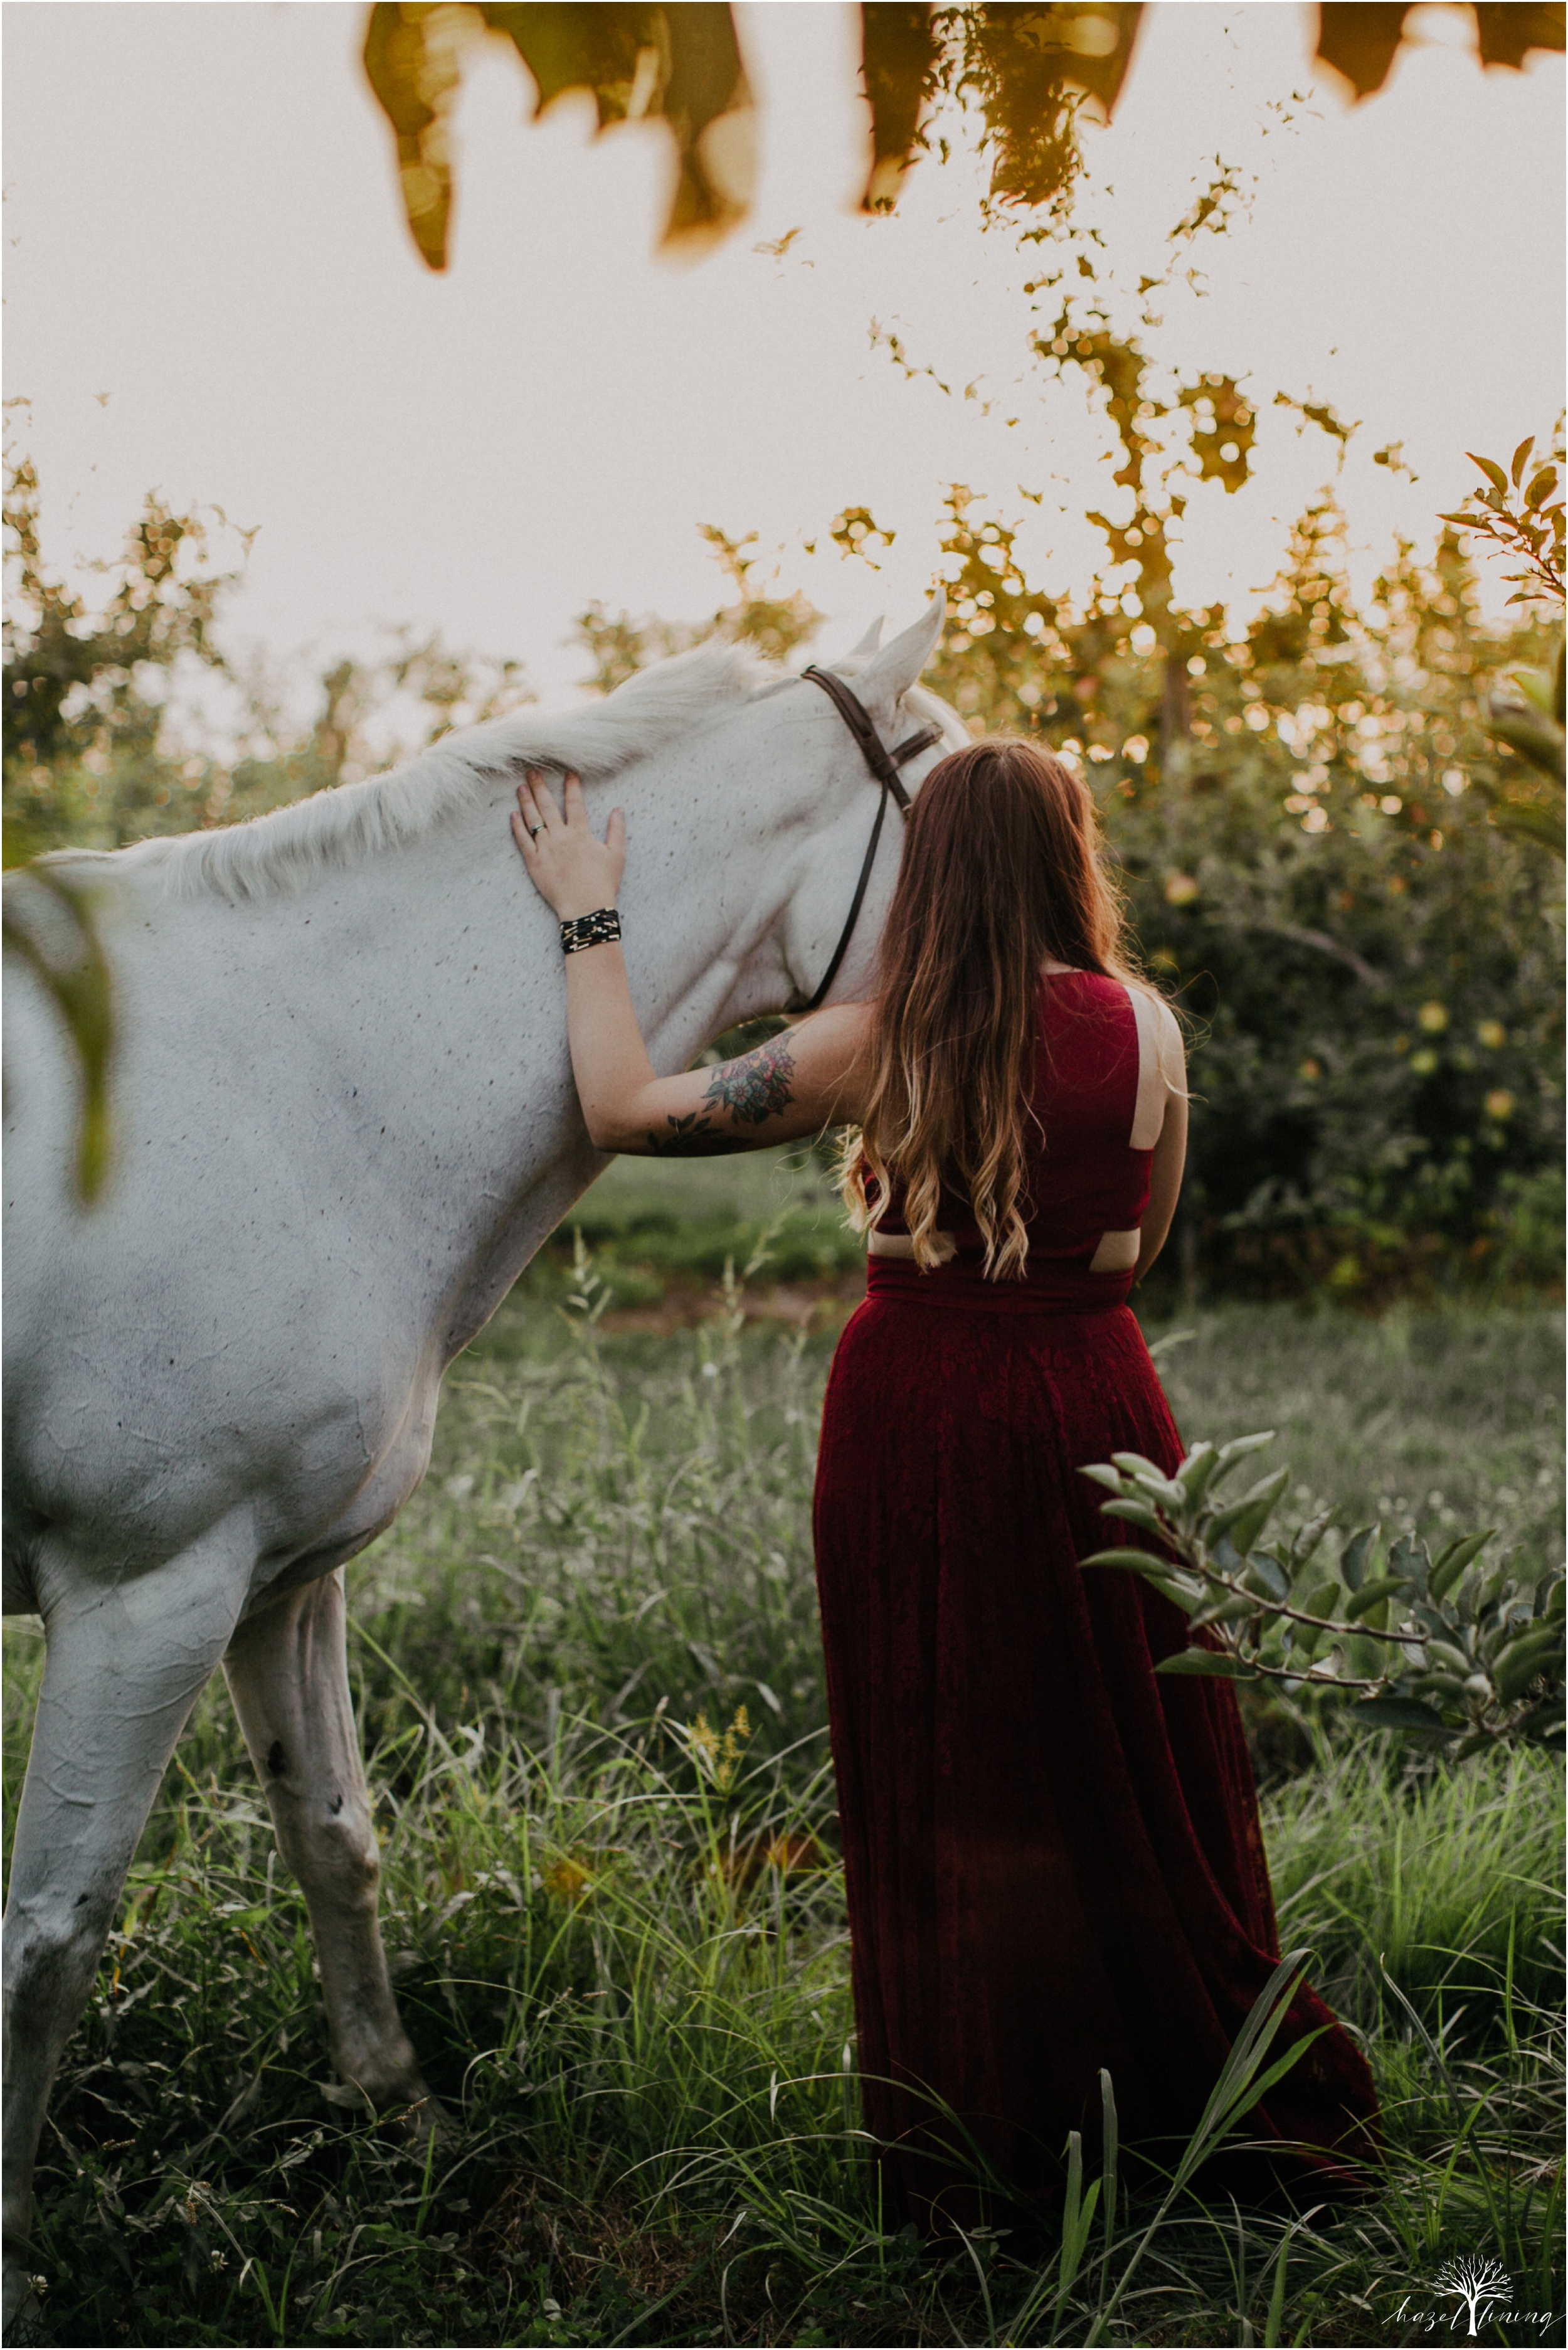 taylor-adams-and-horse-delaware-valley-university-delval-summer-equestrian-portrait-session-hazel-lining-photography-destination-elopement-wedding-engagement-photography_0078.jpg